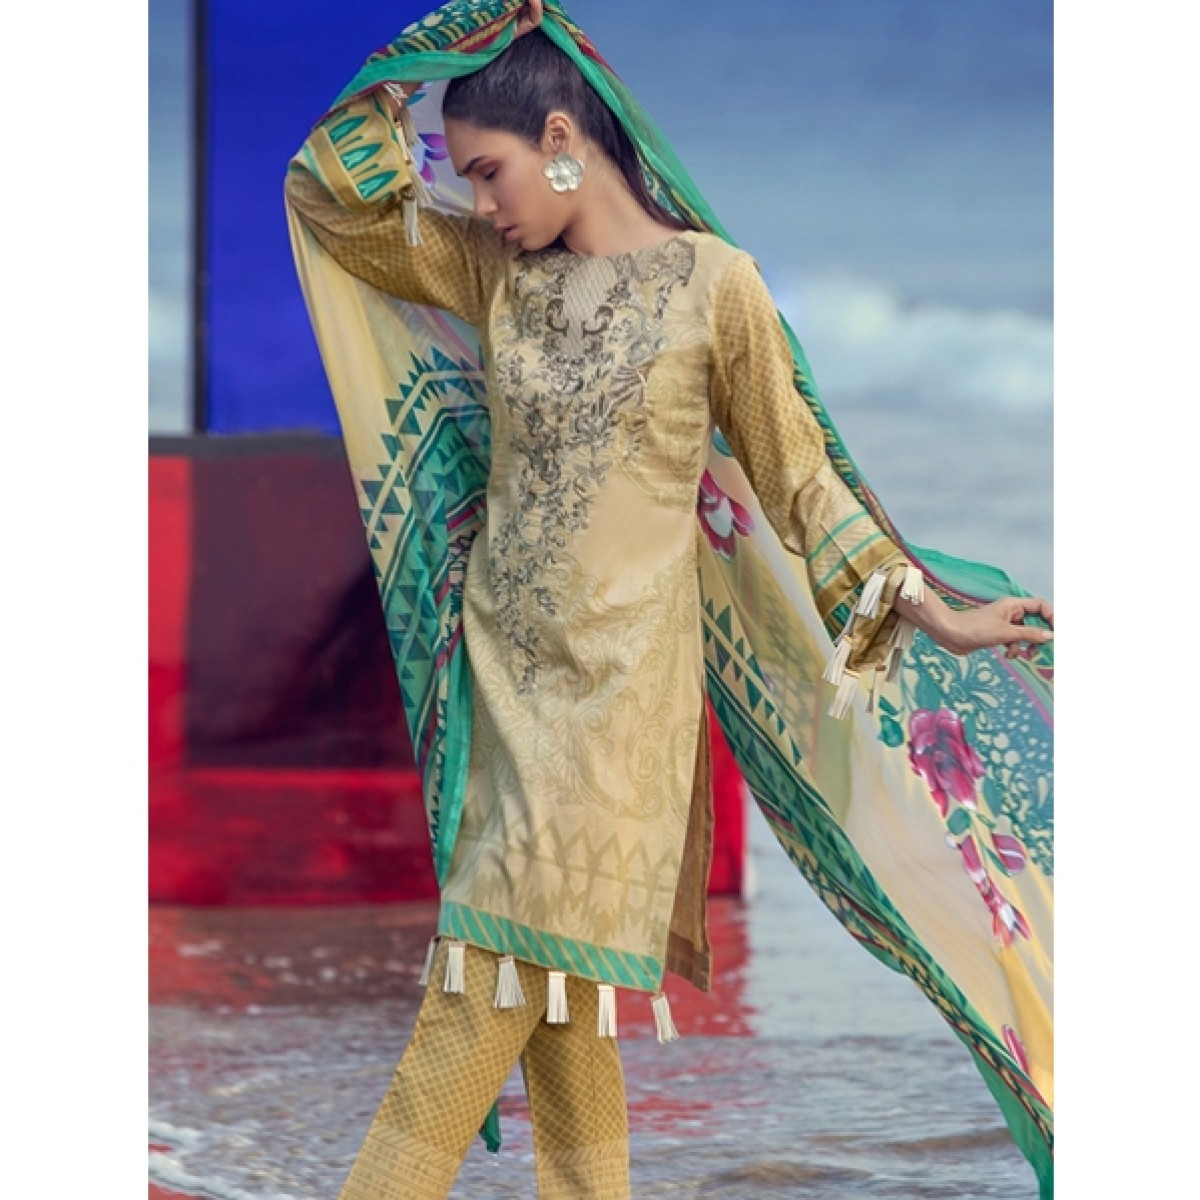 cfbfebe752 Salitex Silkoria Lawn Collection 2019 3 Piece (RC-154B) Price in Pakistan |  Buy Salitex Lawn Collection 2019 Vol-2 | iShopping.pk